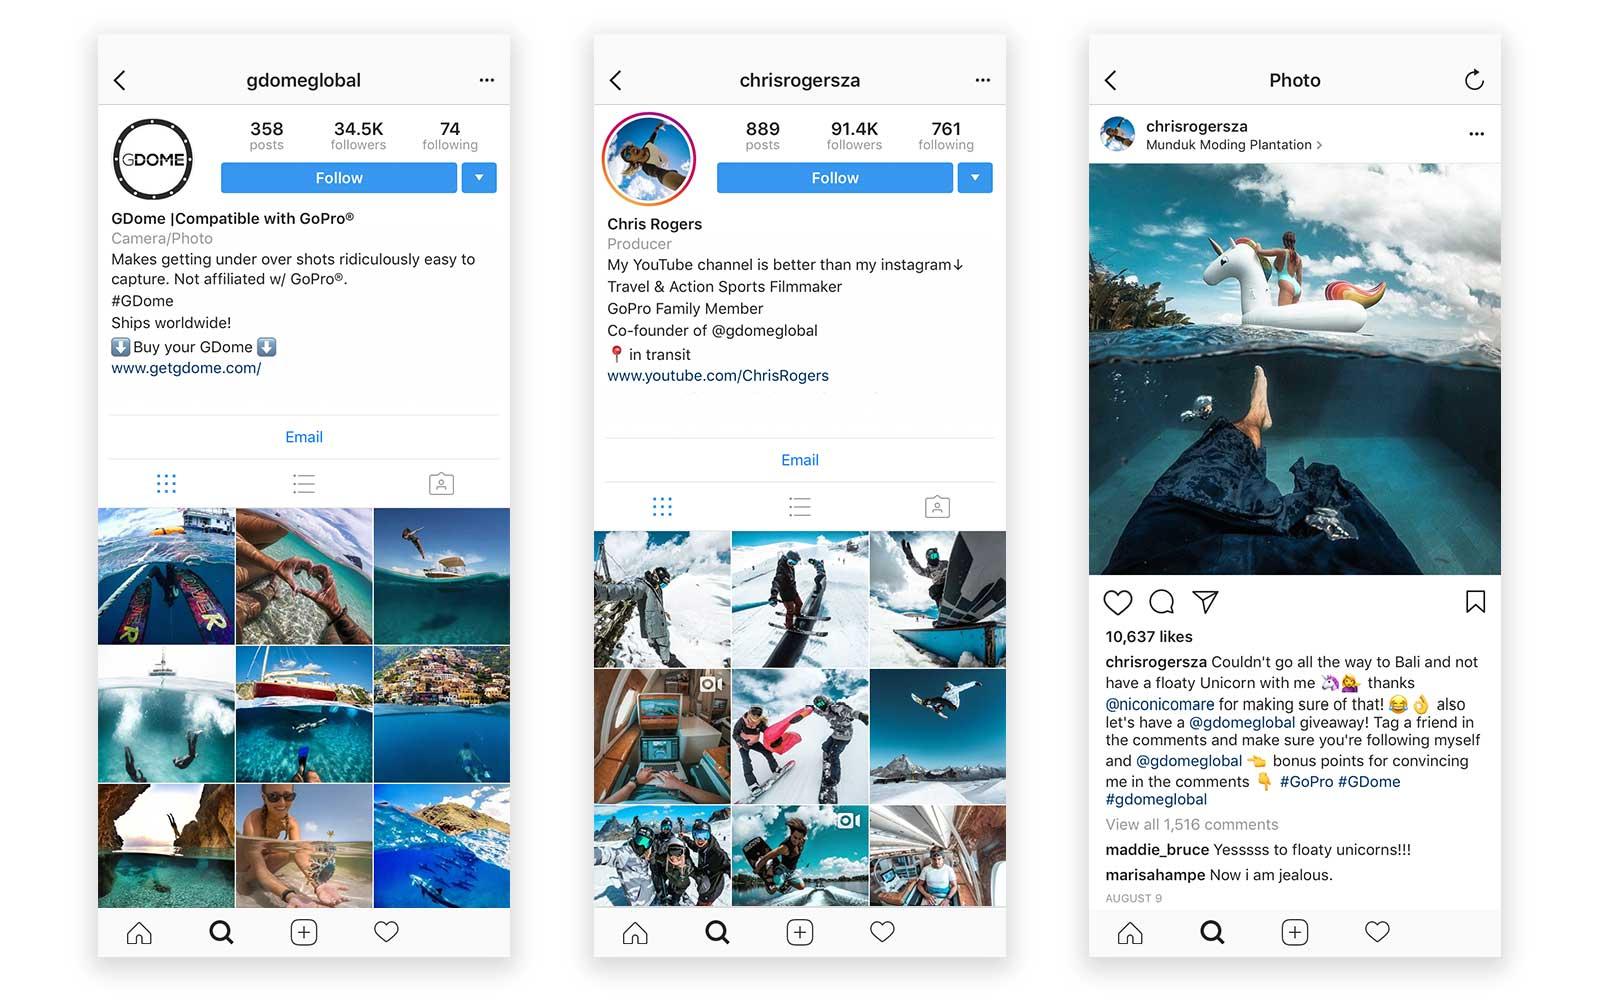 instagram giveaway contest gdomeglobal chrisrogersza